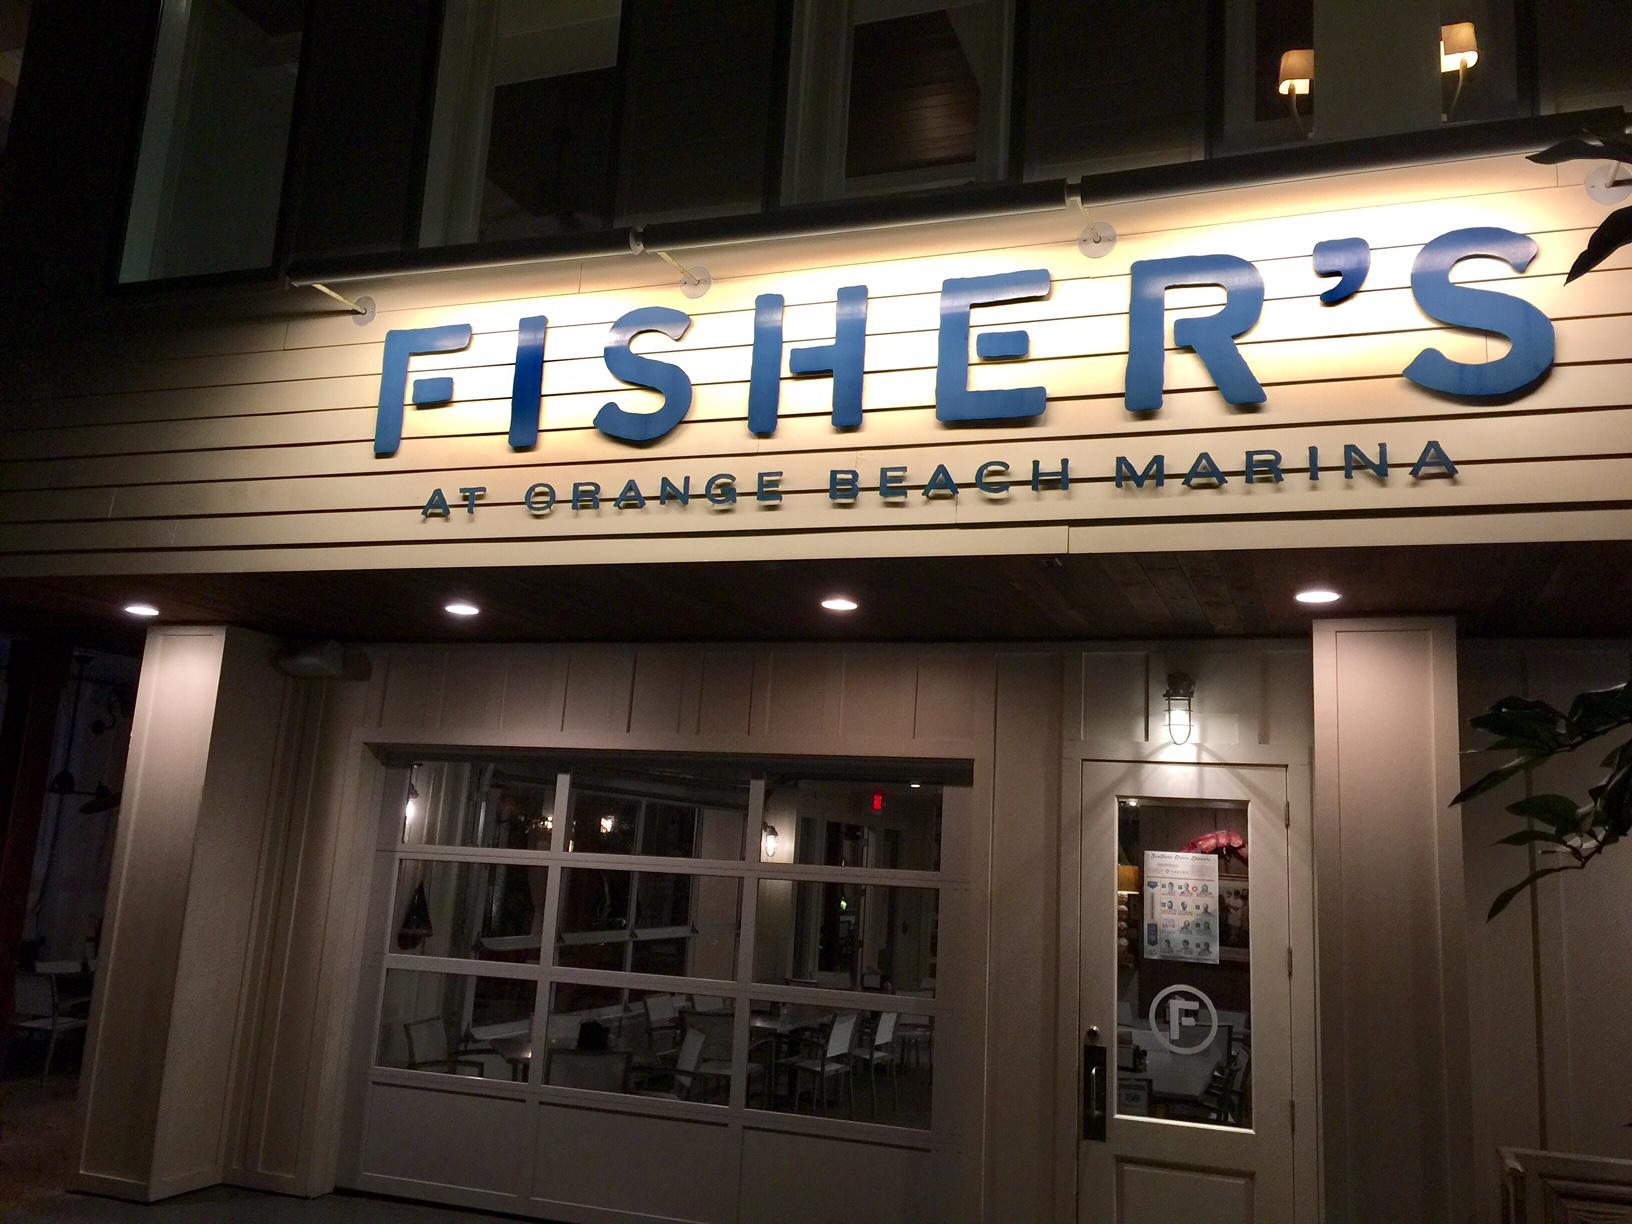 Fishers Restaurant Orange Beach Menu